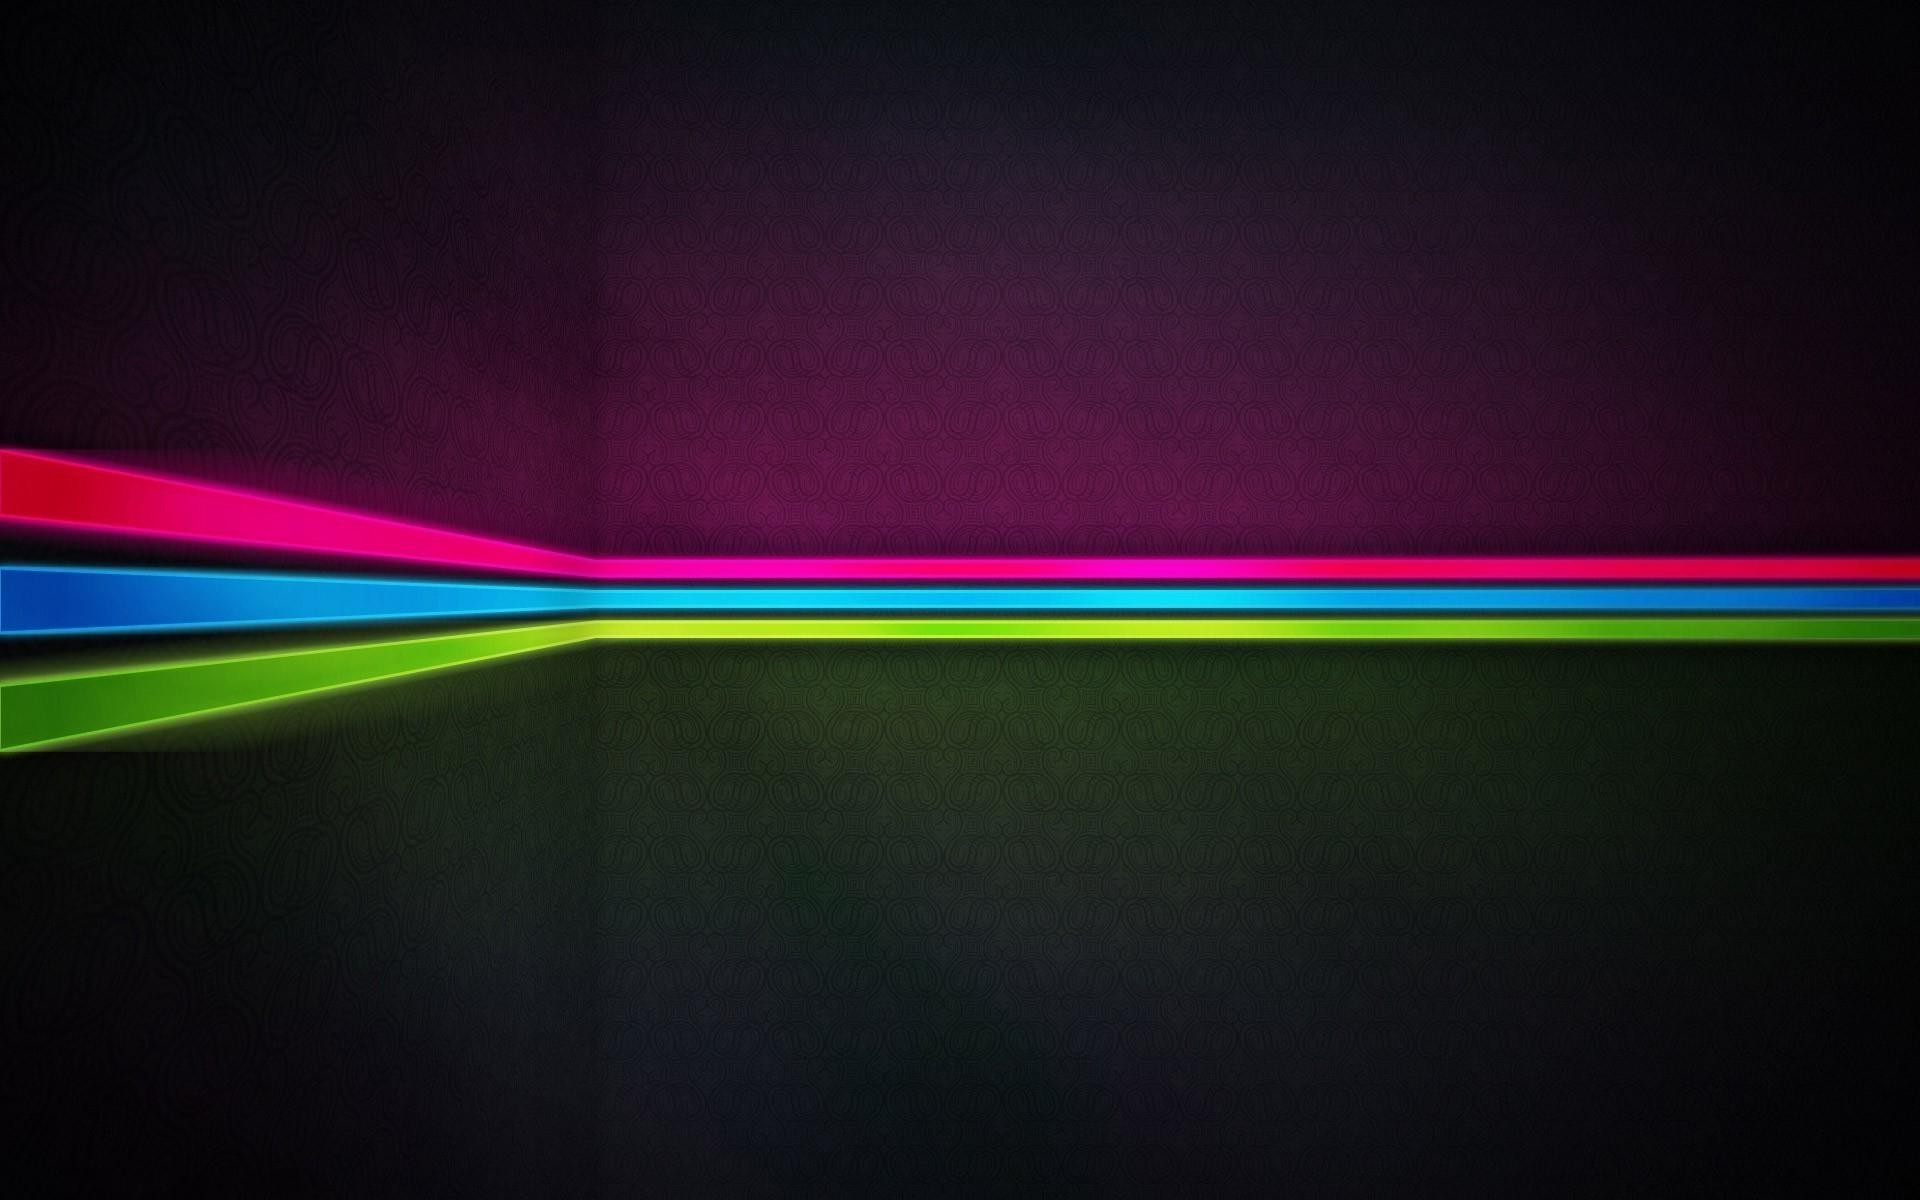 Artistic Lines Neon Wallpaper